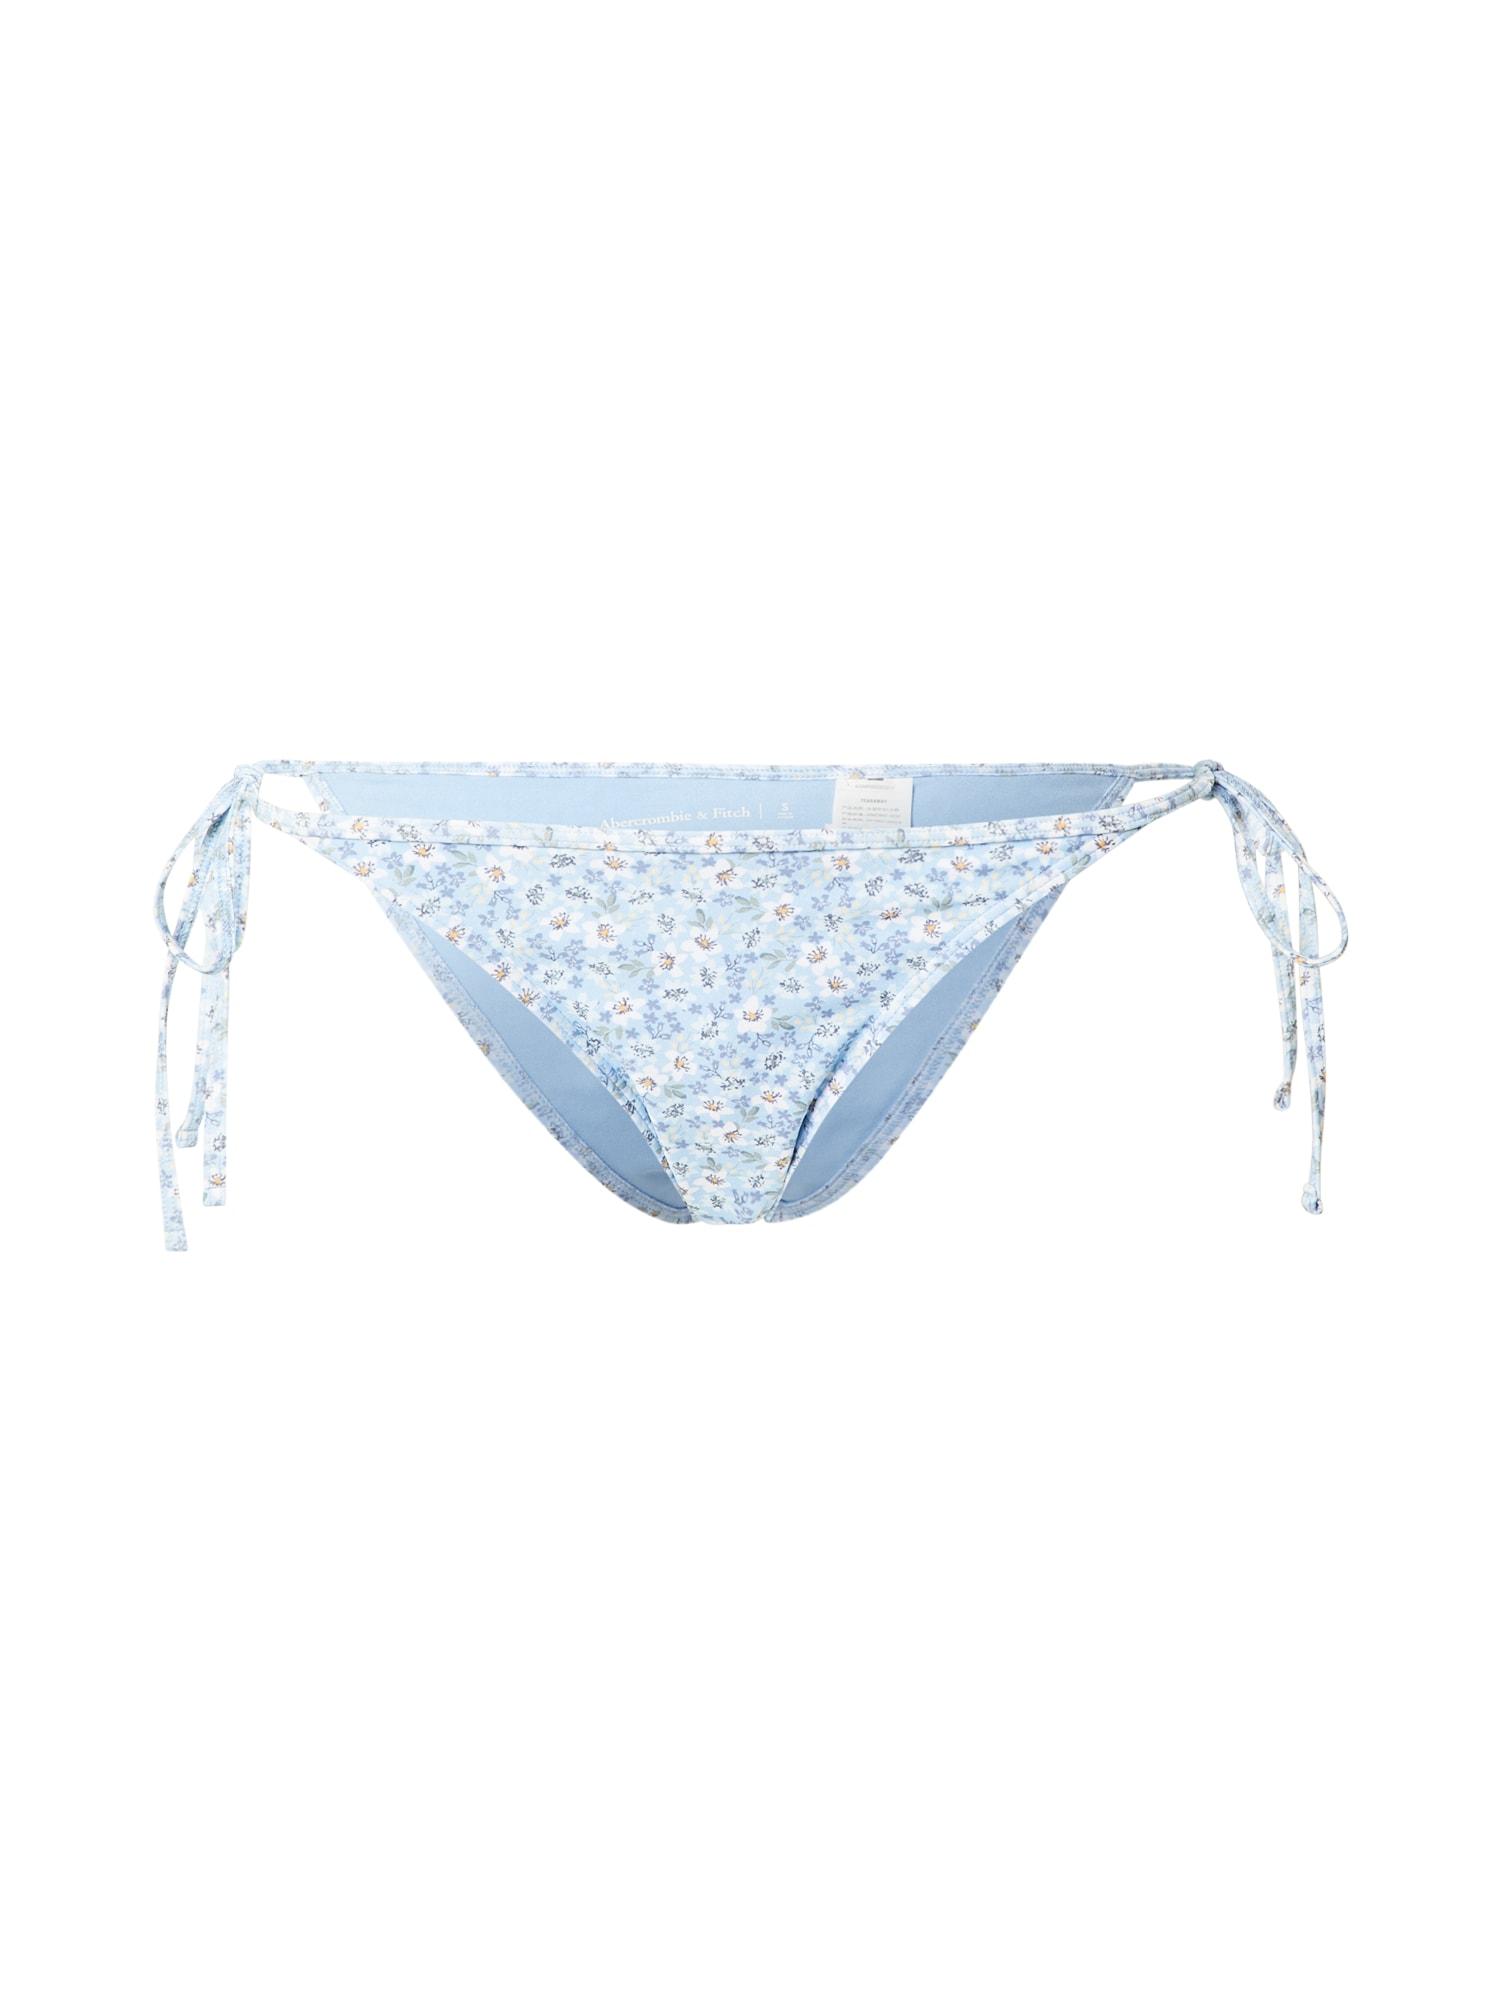 "Abercrombie & Fitch Bikinio kelnaitės šviesiai mėlyna / balta / šviesiai geltona / sodri mėlyna (""karališka"")"